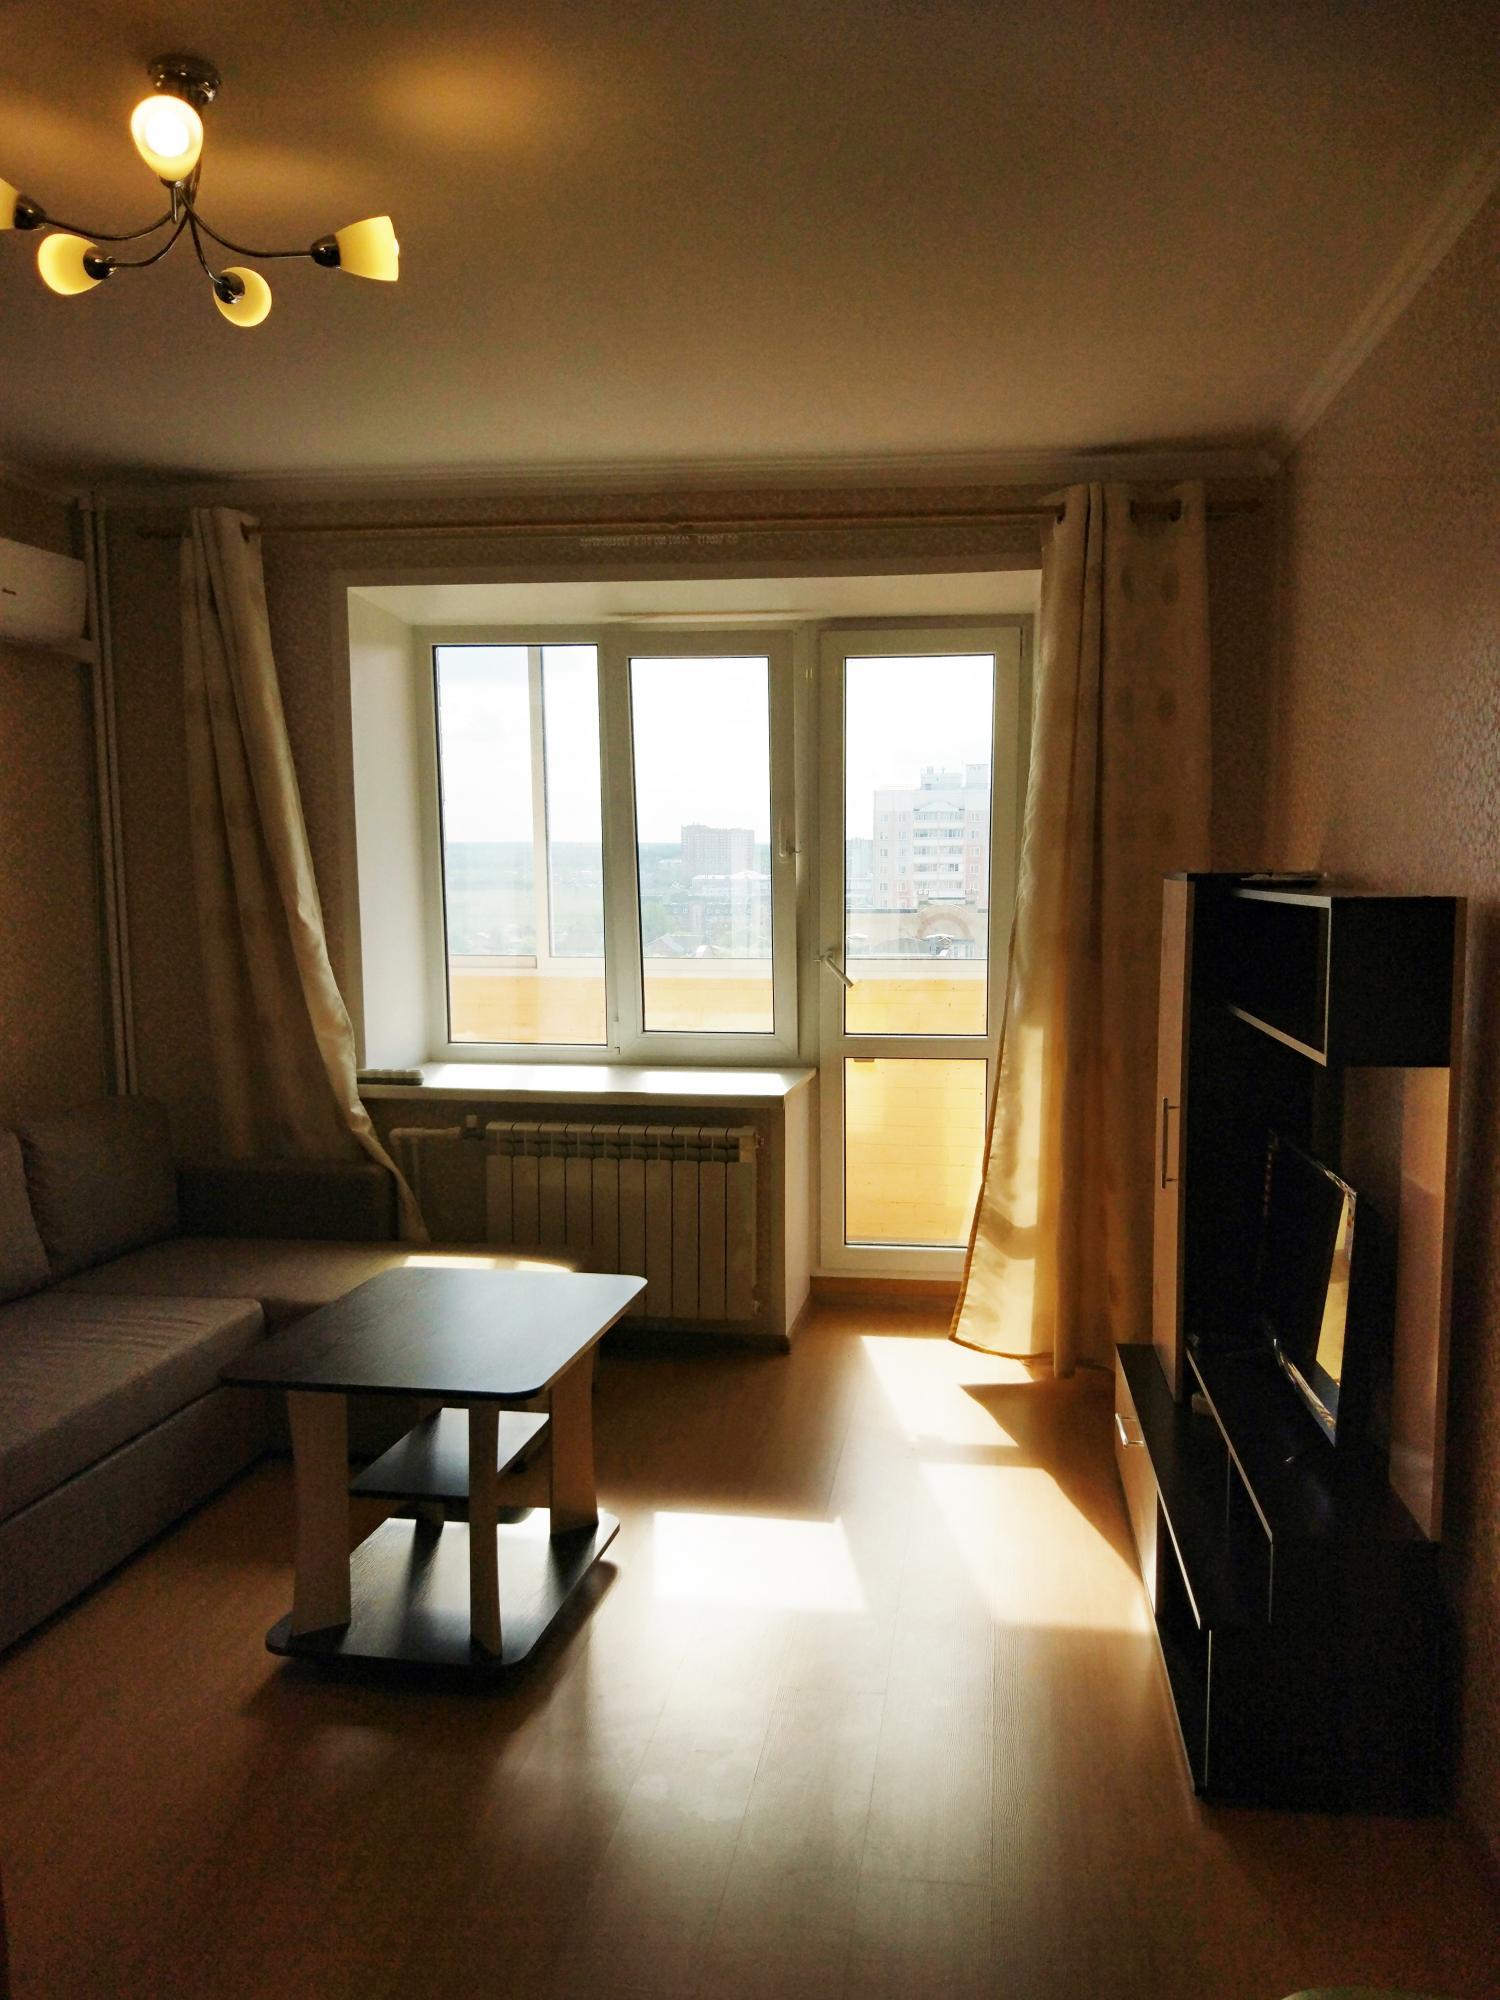 Квартира, 1 комната, 38 м² в Климовске 89258731076 купить 7